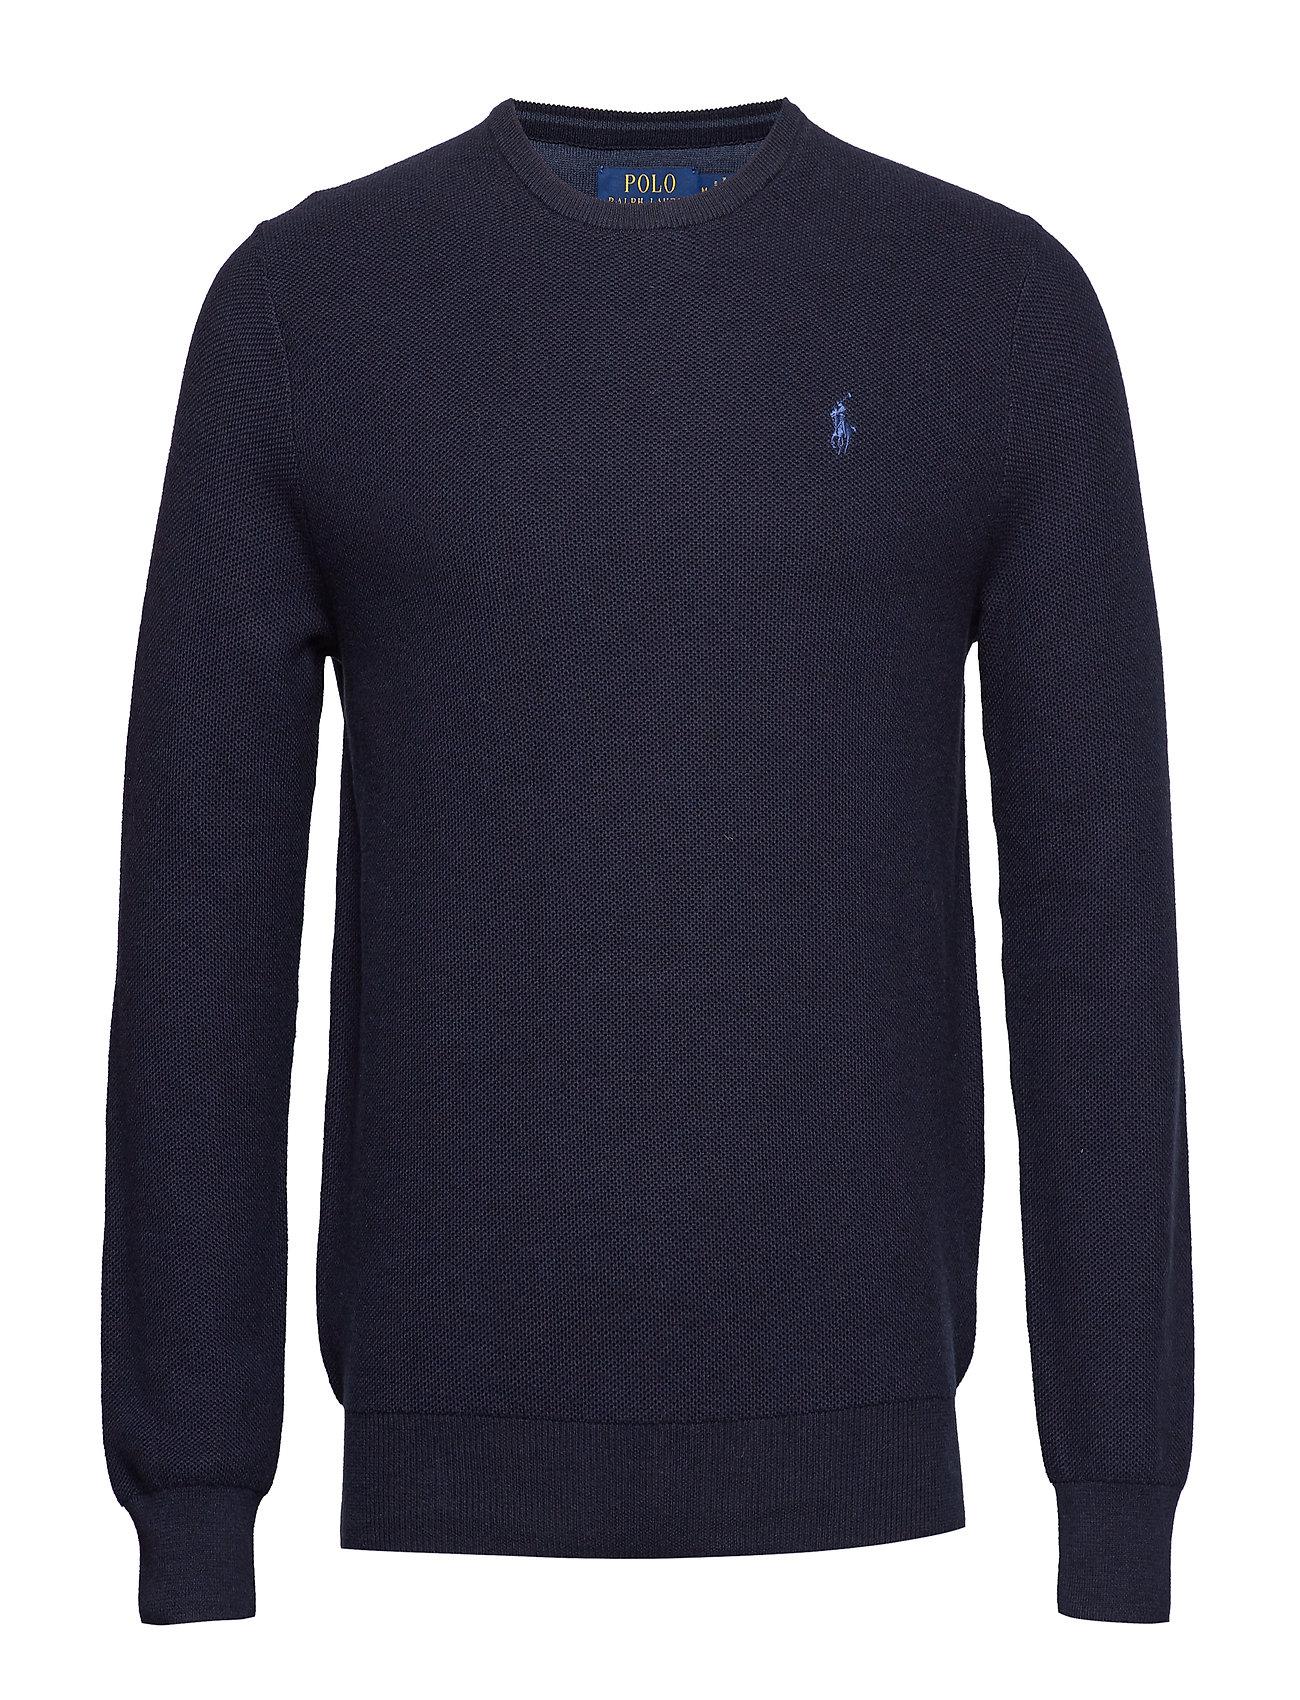 Polo Ralph Lauren Cotton Crewneck Sweater - NAVY HEATHER